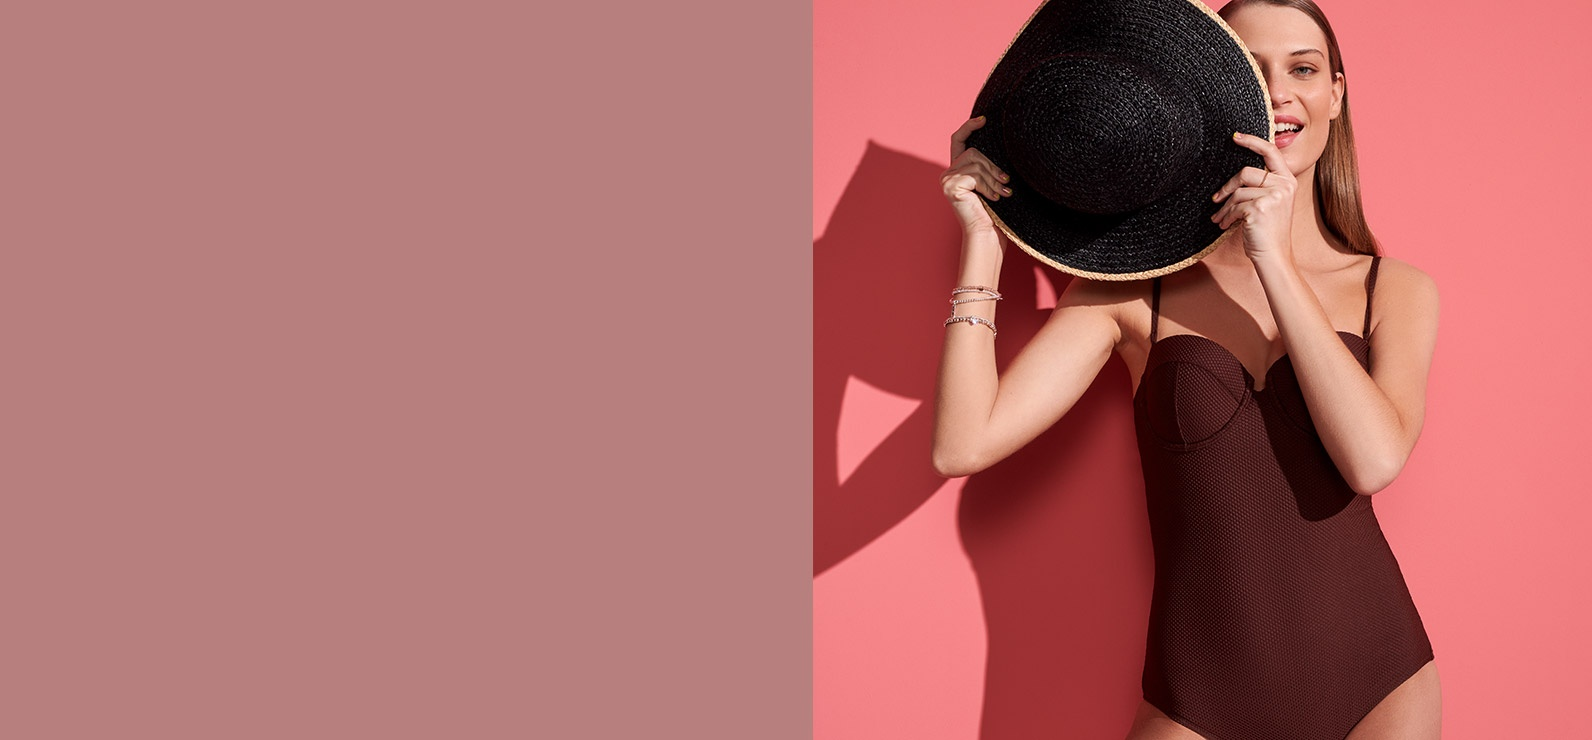 762058dab30a39 J By Jasper Conran Women's Clothing & Accessories | Debenhams